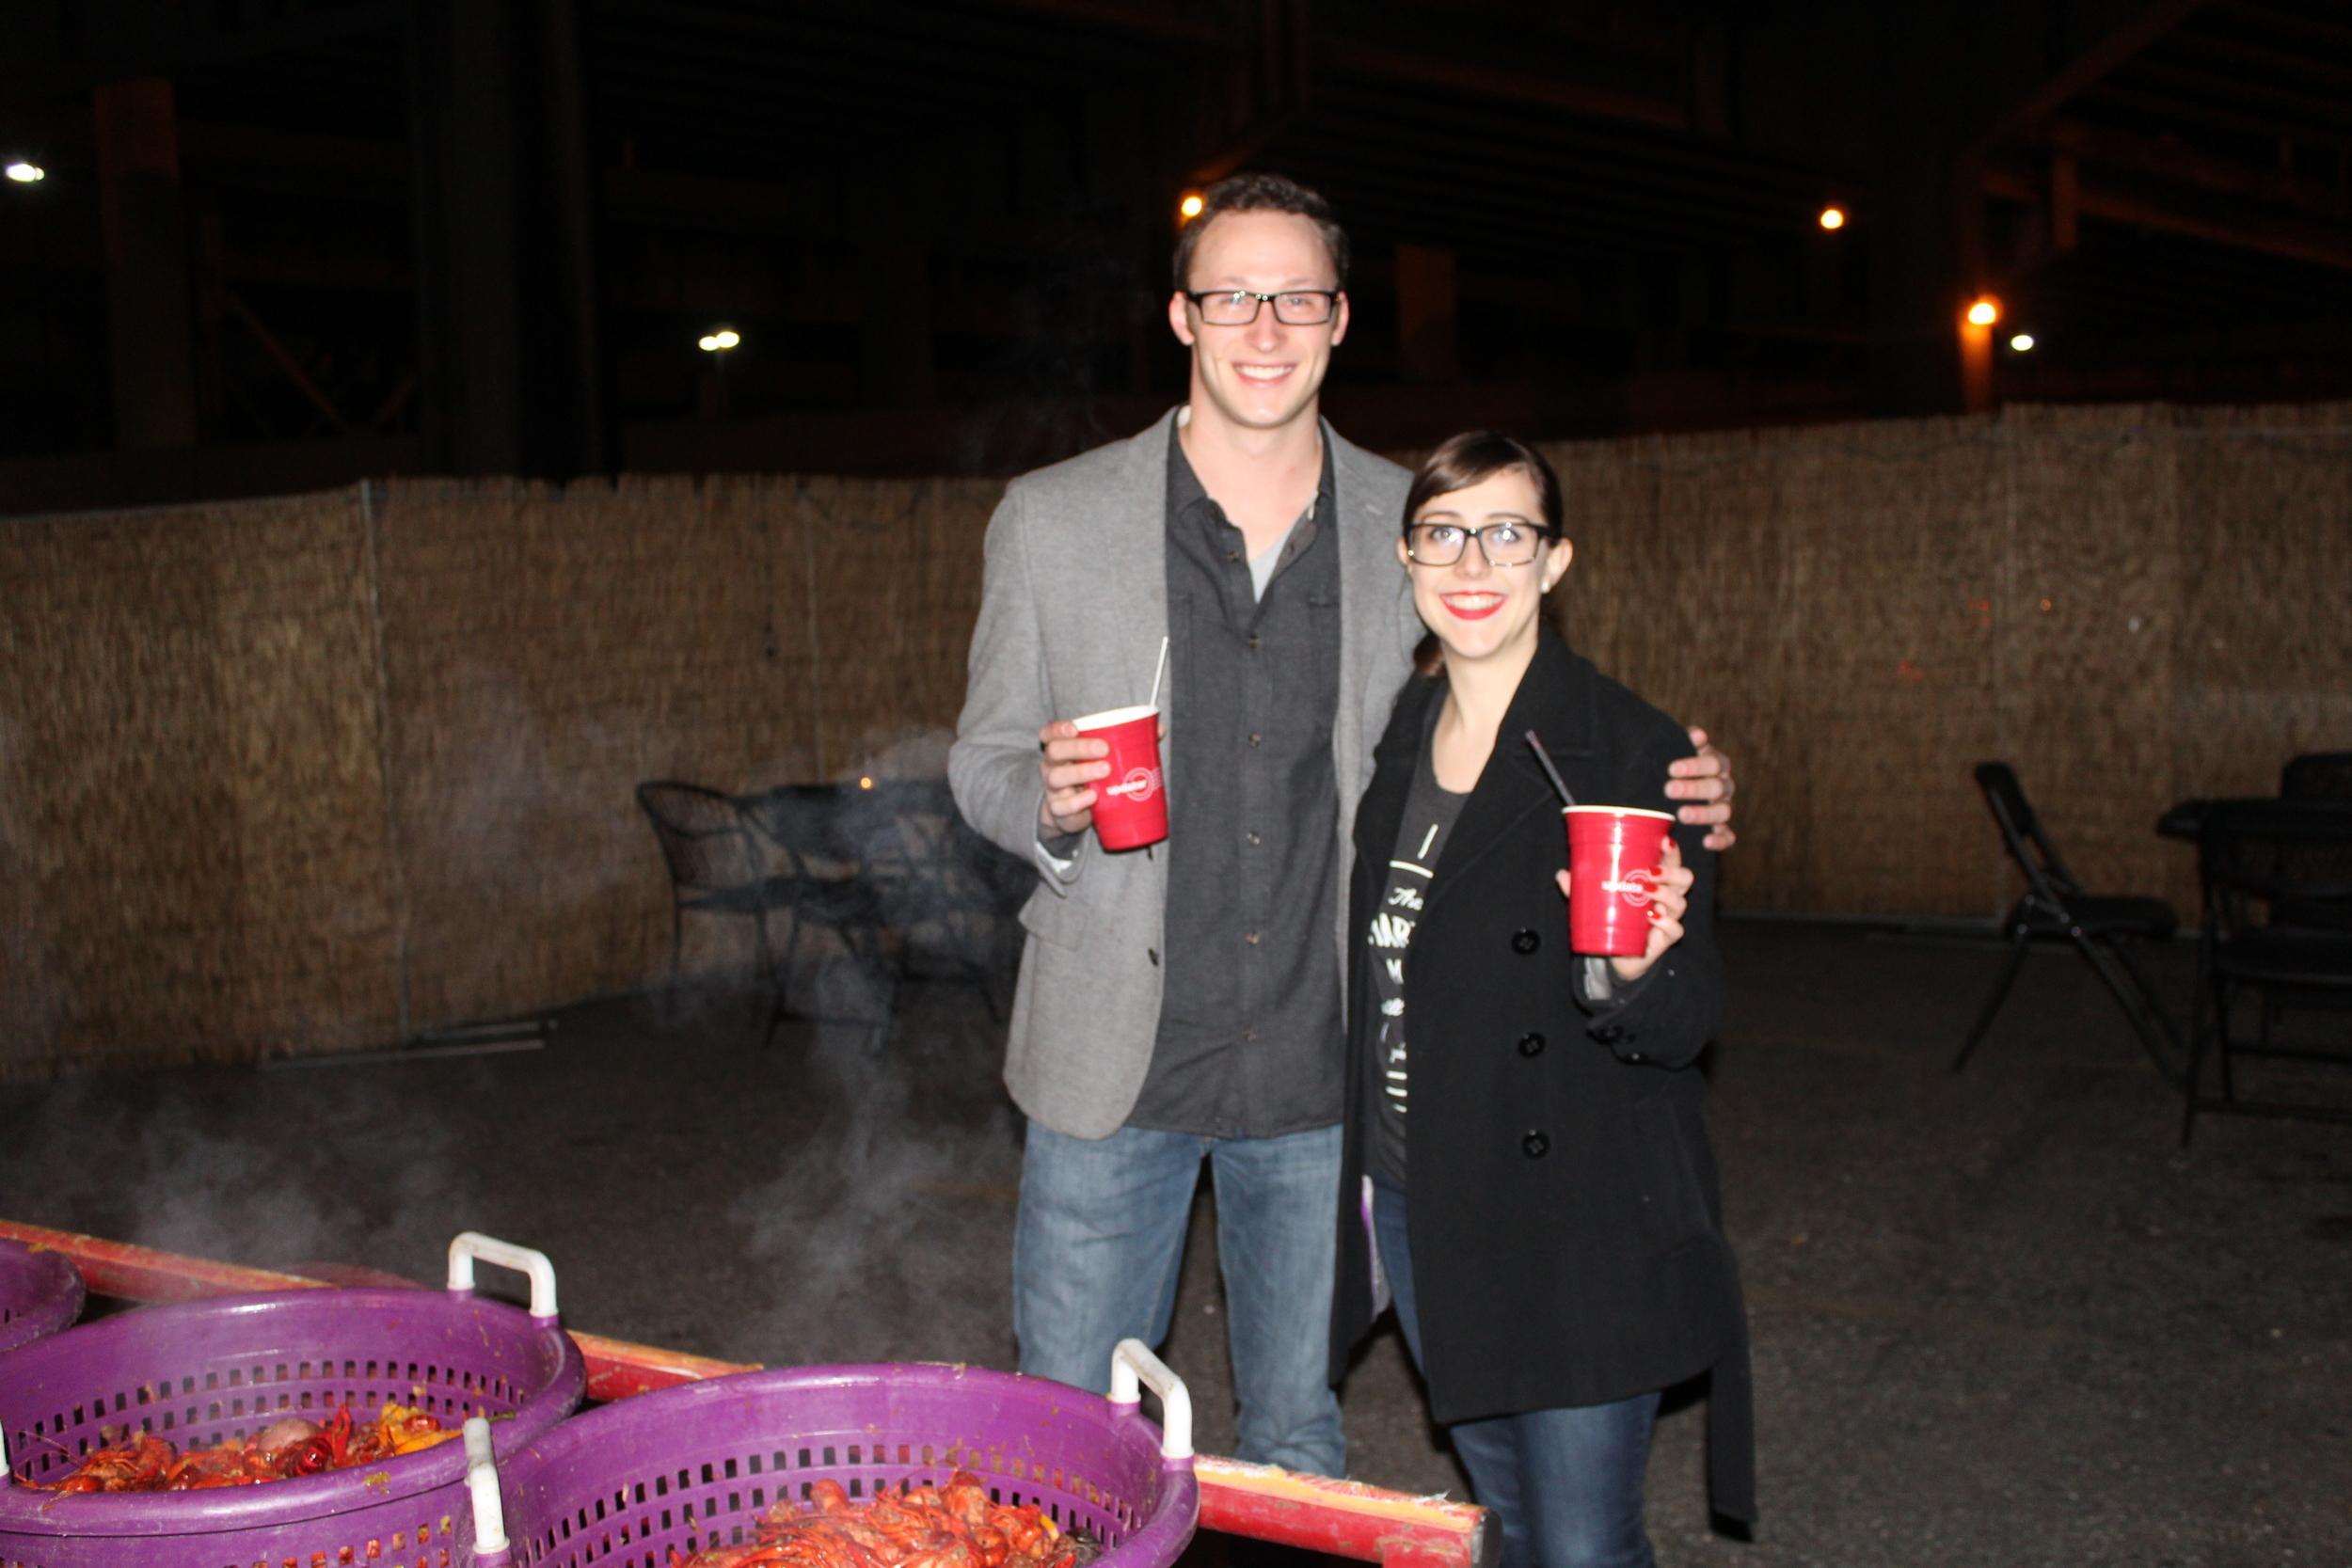 Updater Success Manager, Lauren Berry, with Scott Brzezinski of Shur-Way Moving & Cartage